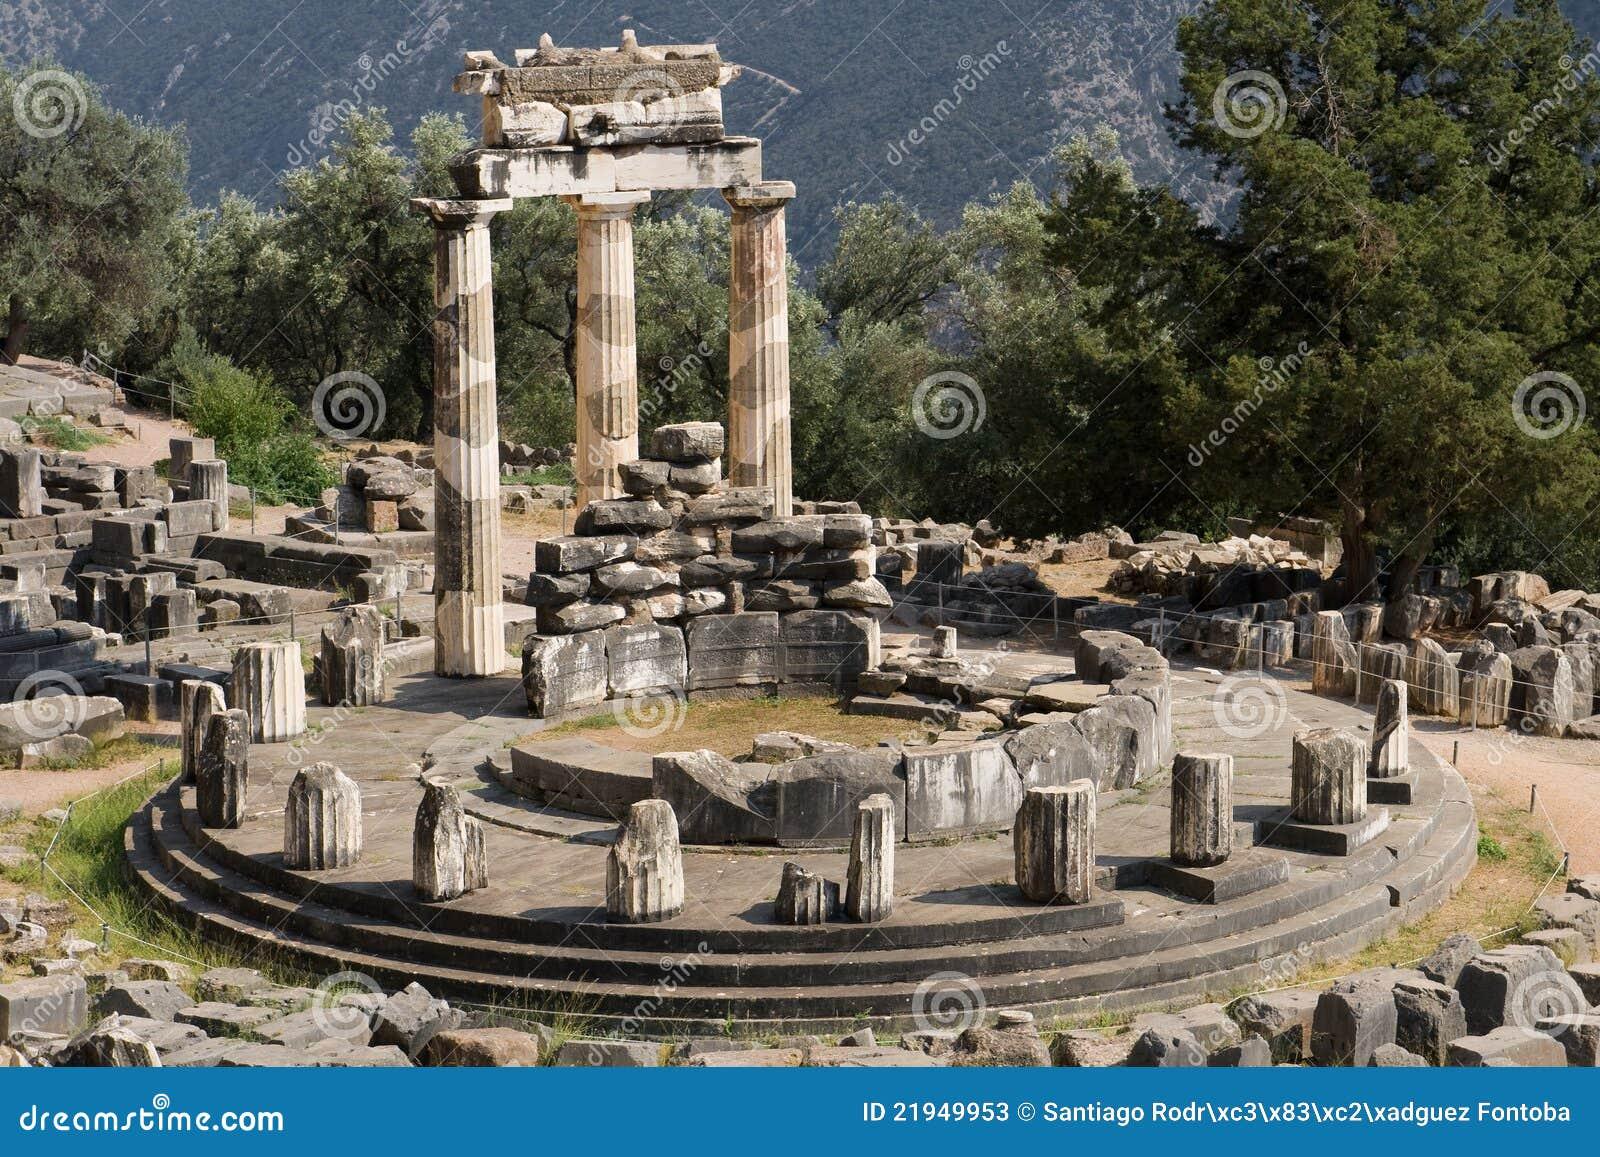 Tholos Of Delphi Stock Photos - Image: 21949953